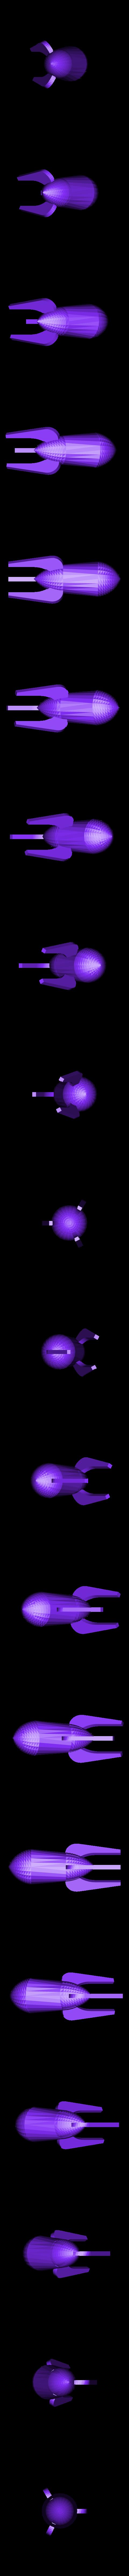 retrorocket.stl Download free STL file Retro Rocket. • 3D printable object, GeneralElectric